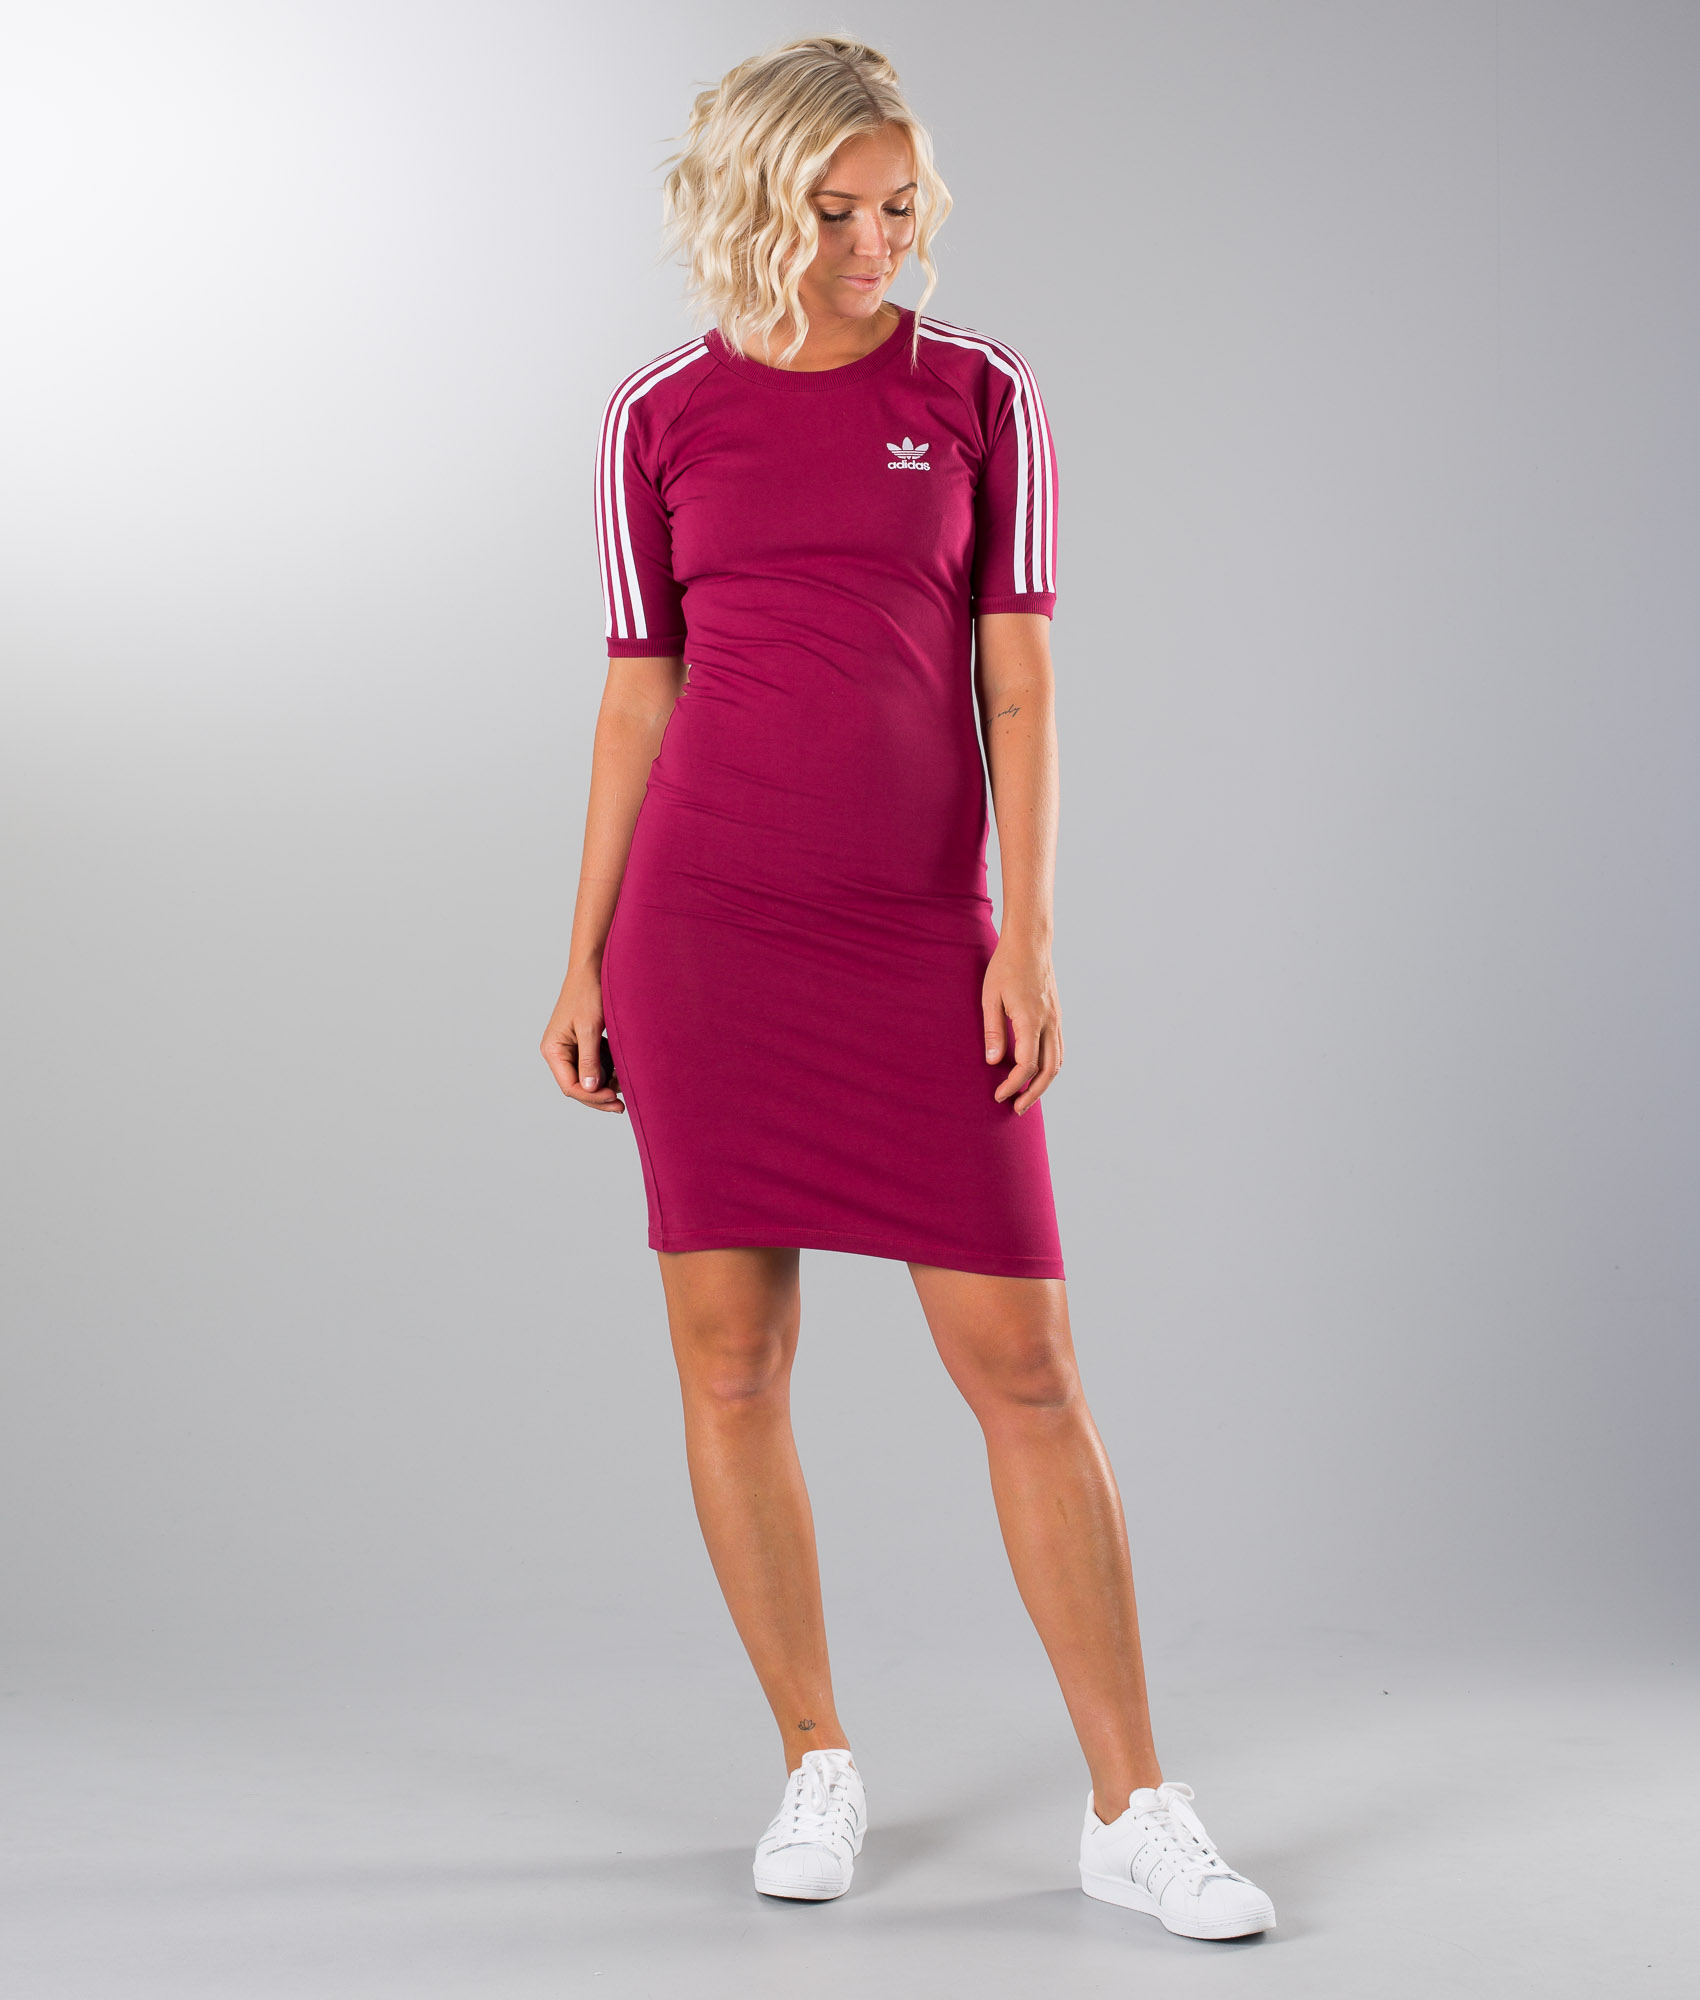 Adidas 3 Stripes F17 Kjole Ridestore Ruby no Mystery Originals Dress rwr6g